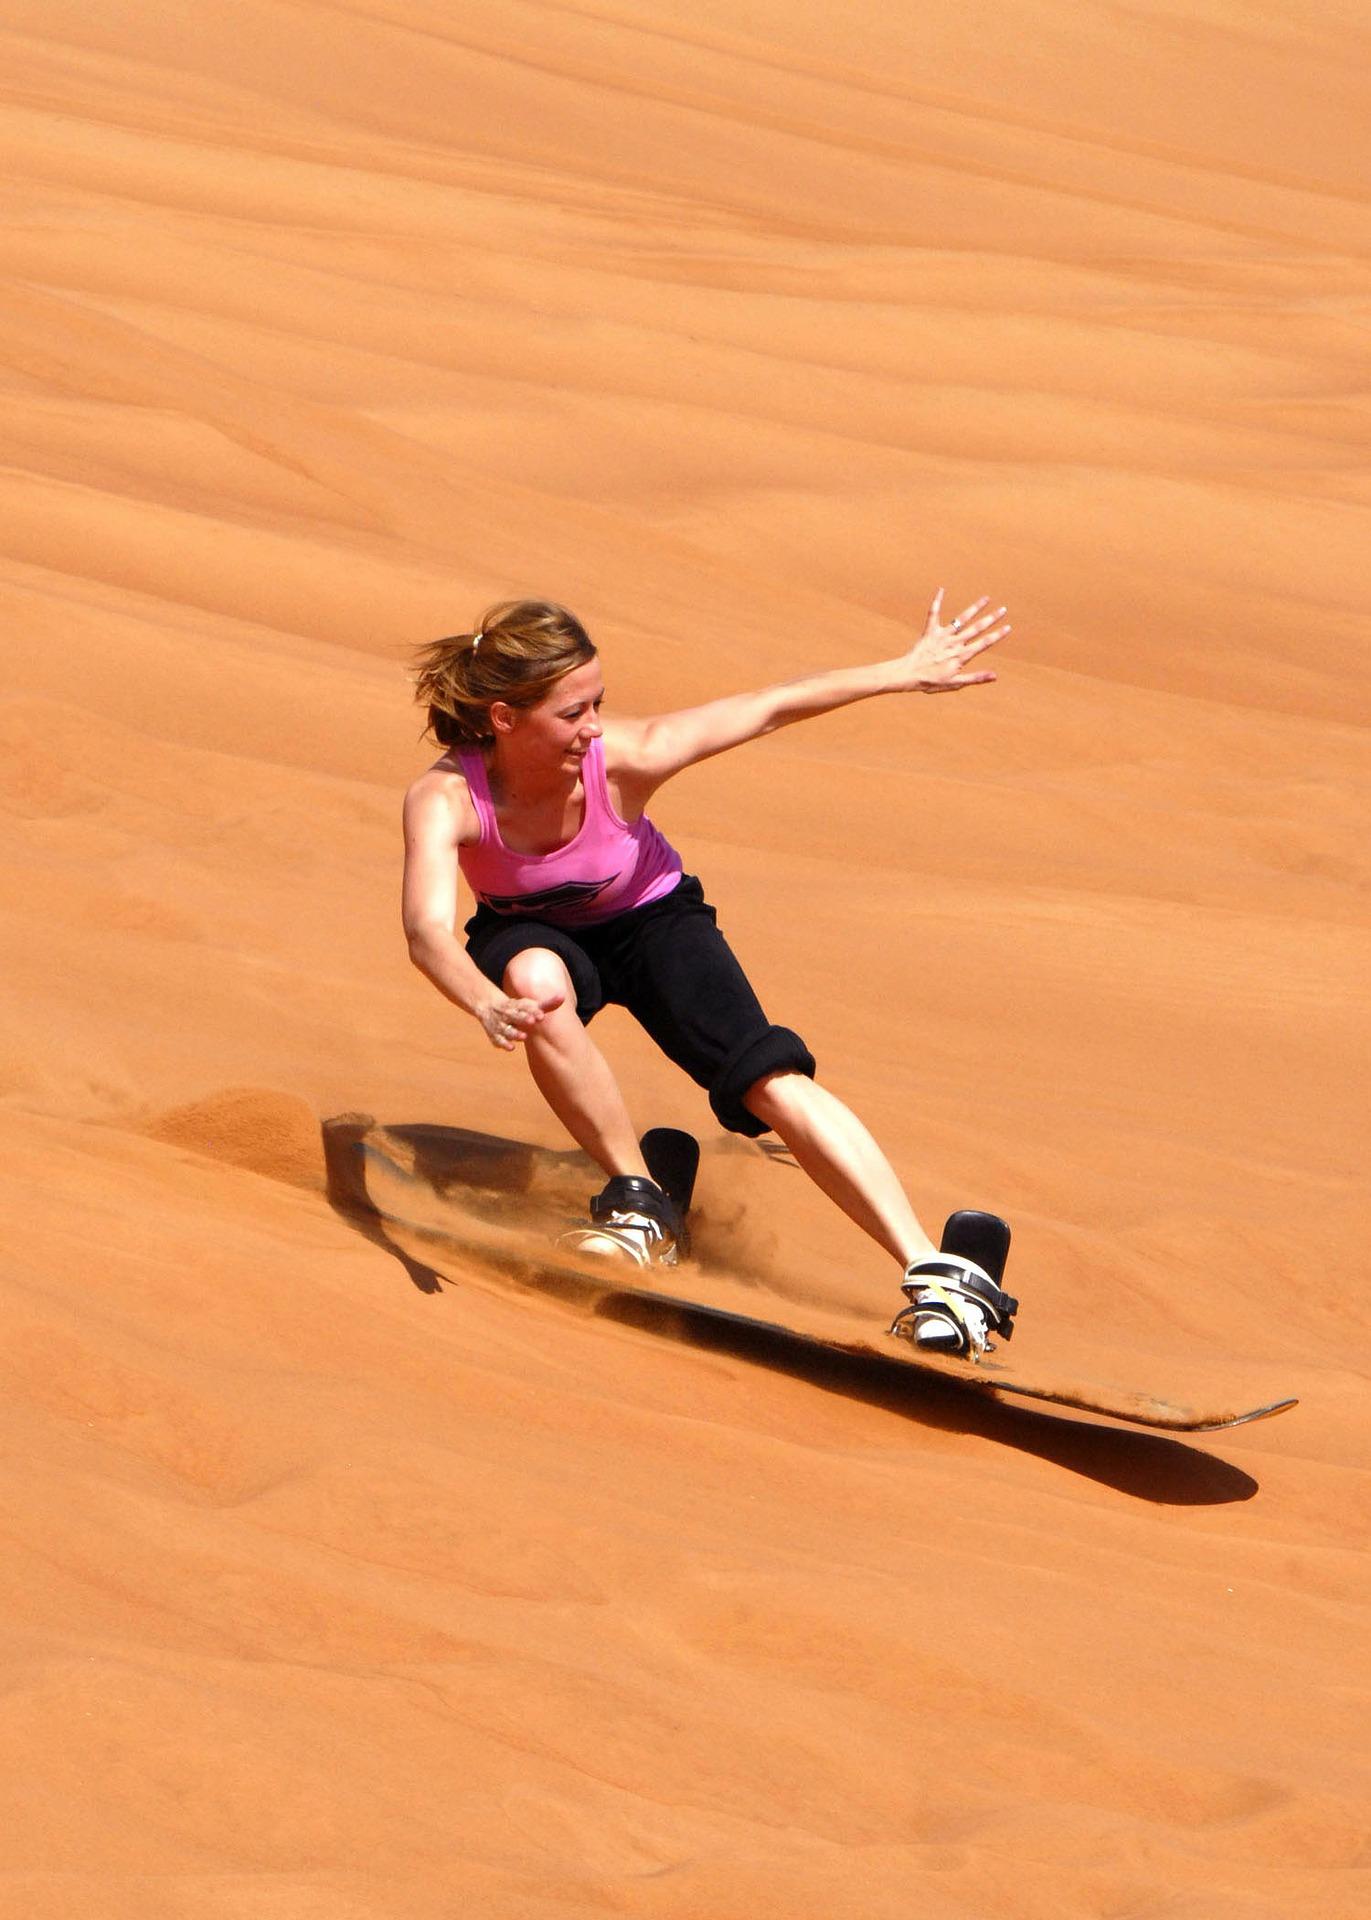 Woman sandboarding in Dubai